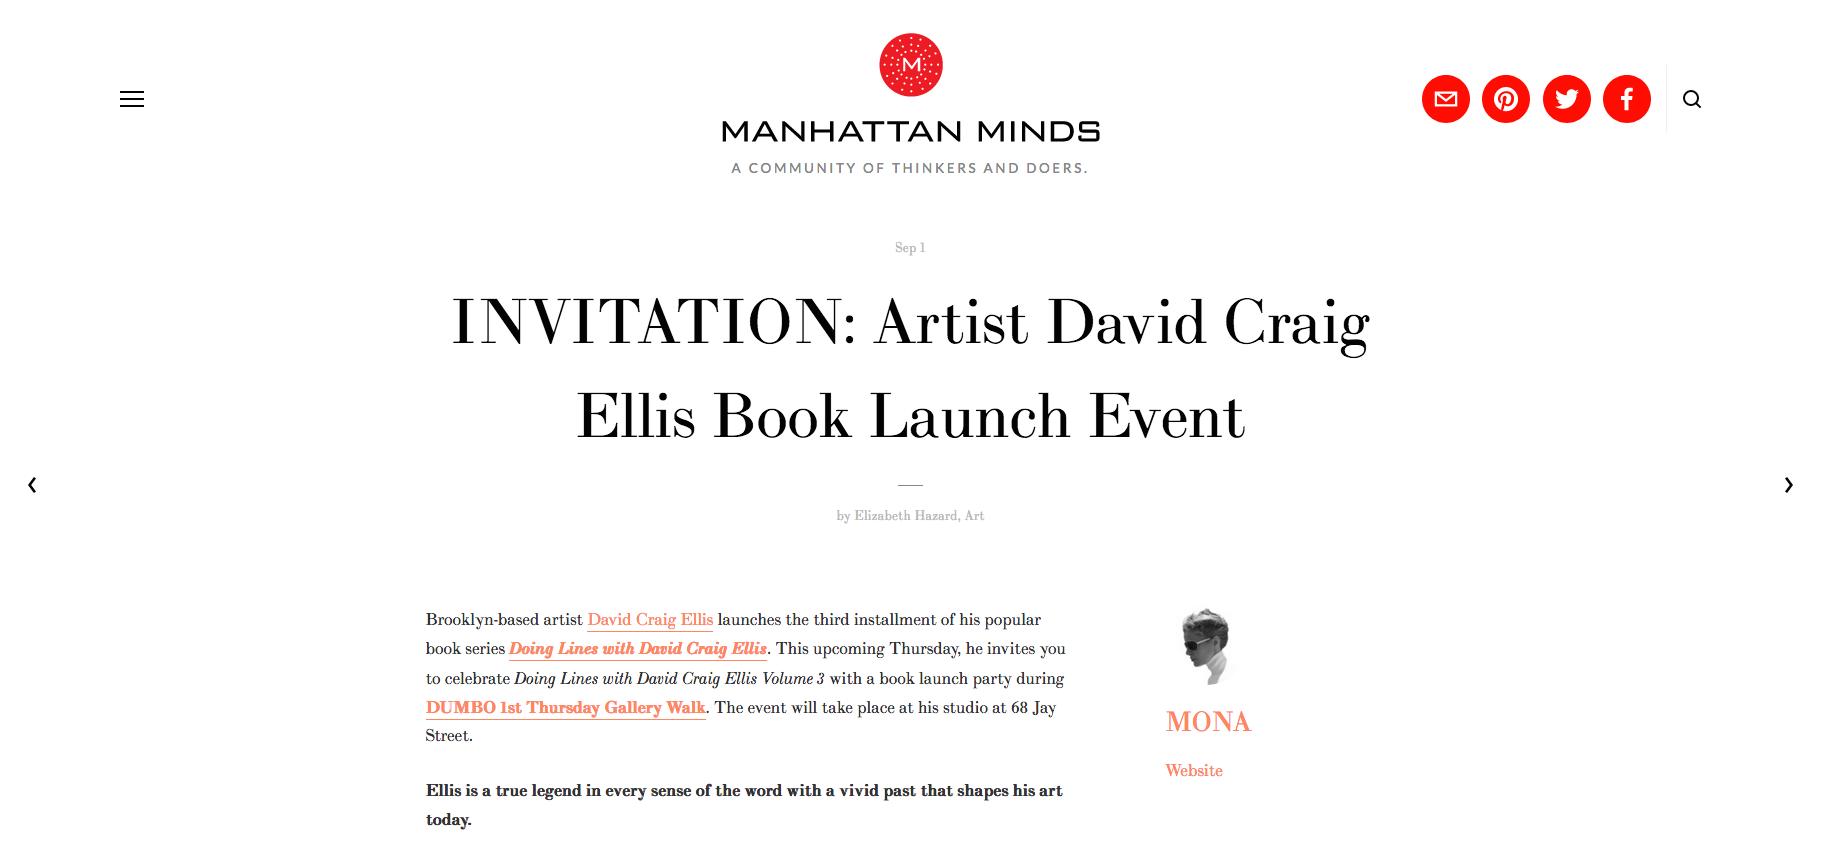 Manhattan Minds - Invitation: David Craig Ellis Book Launch Event